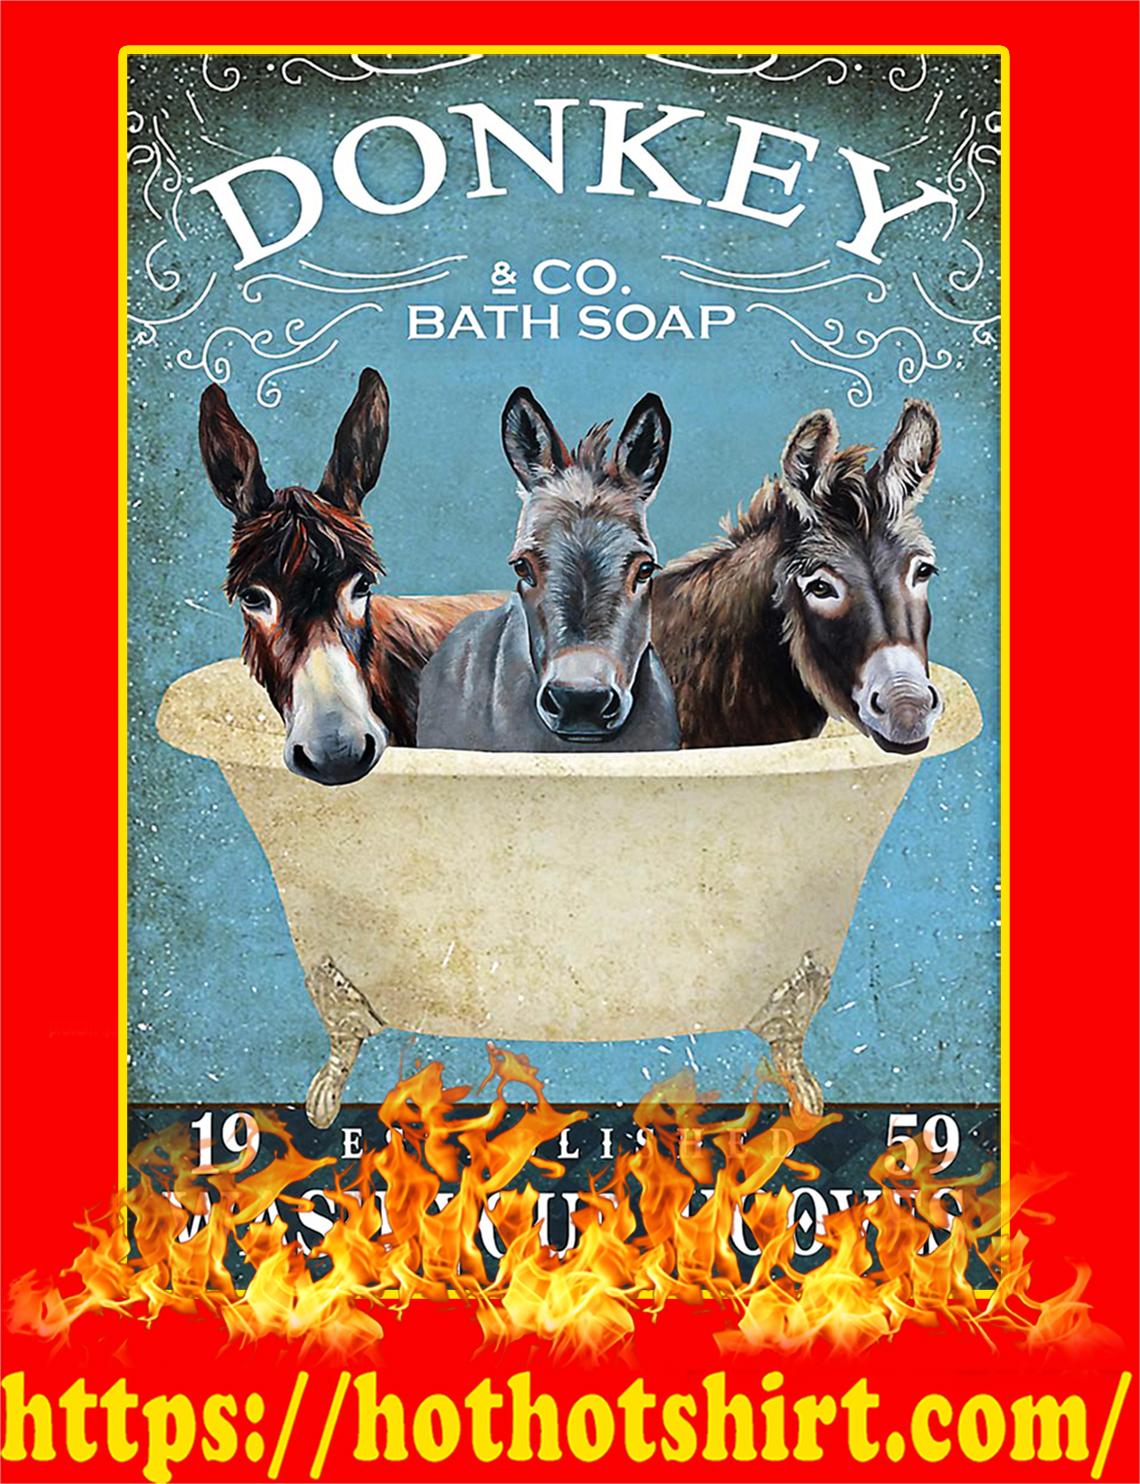 Donkey Company Bath Soap Poster - A1